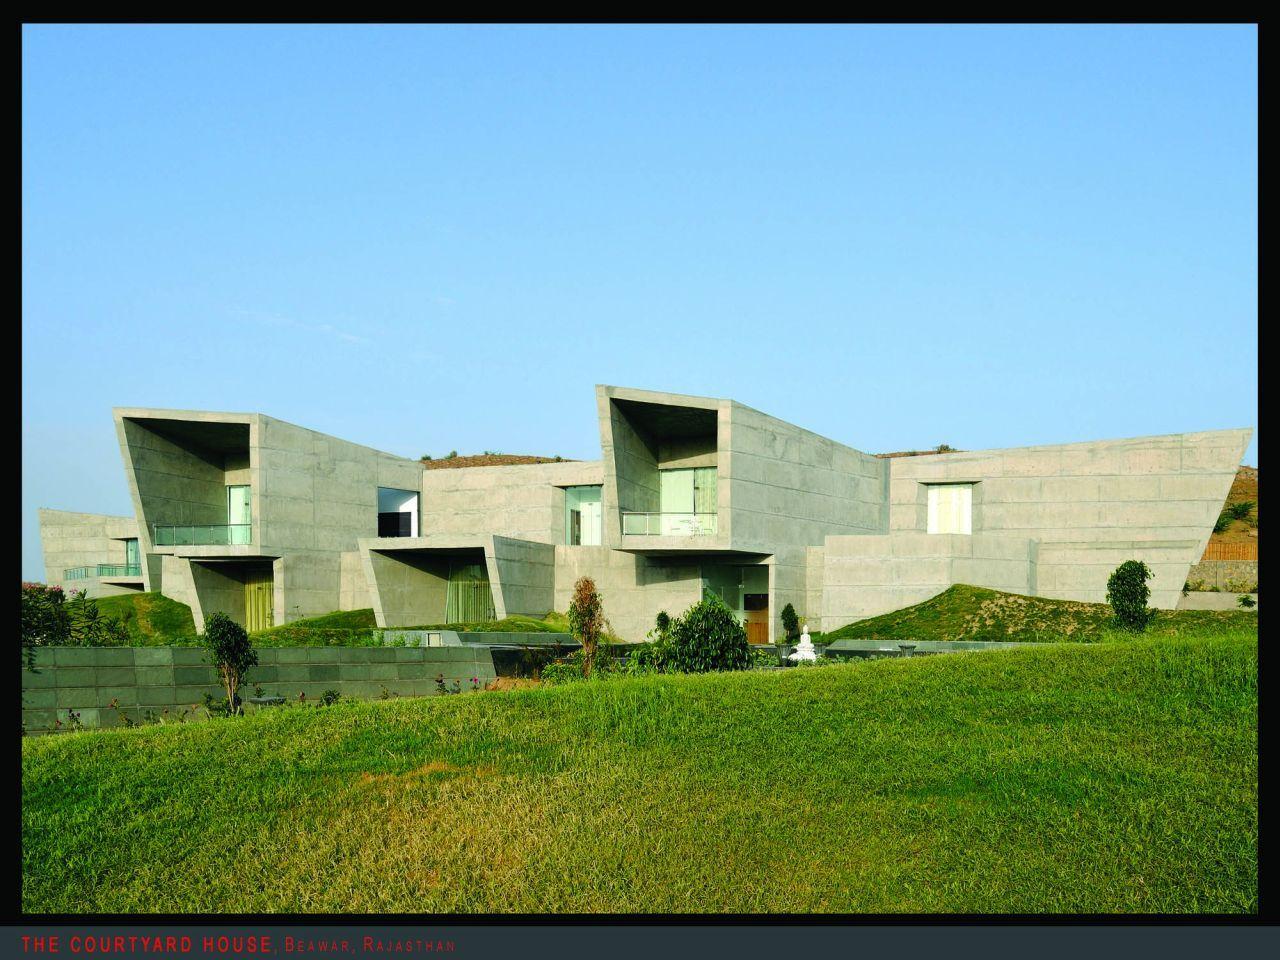 Casa Pátio / Sanjay Puri Architects, © Cortesia de Sanjay Puri Architects